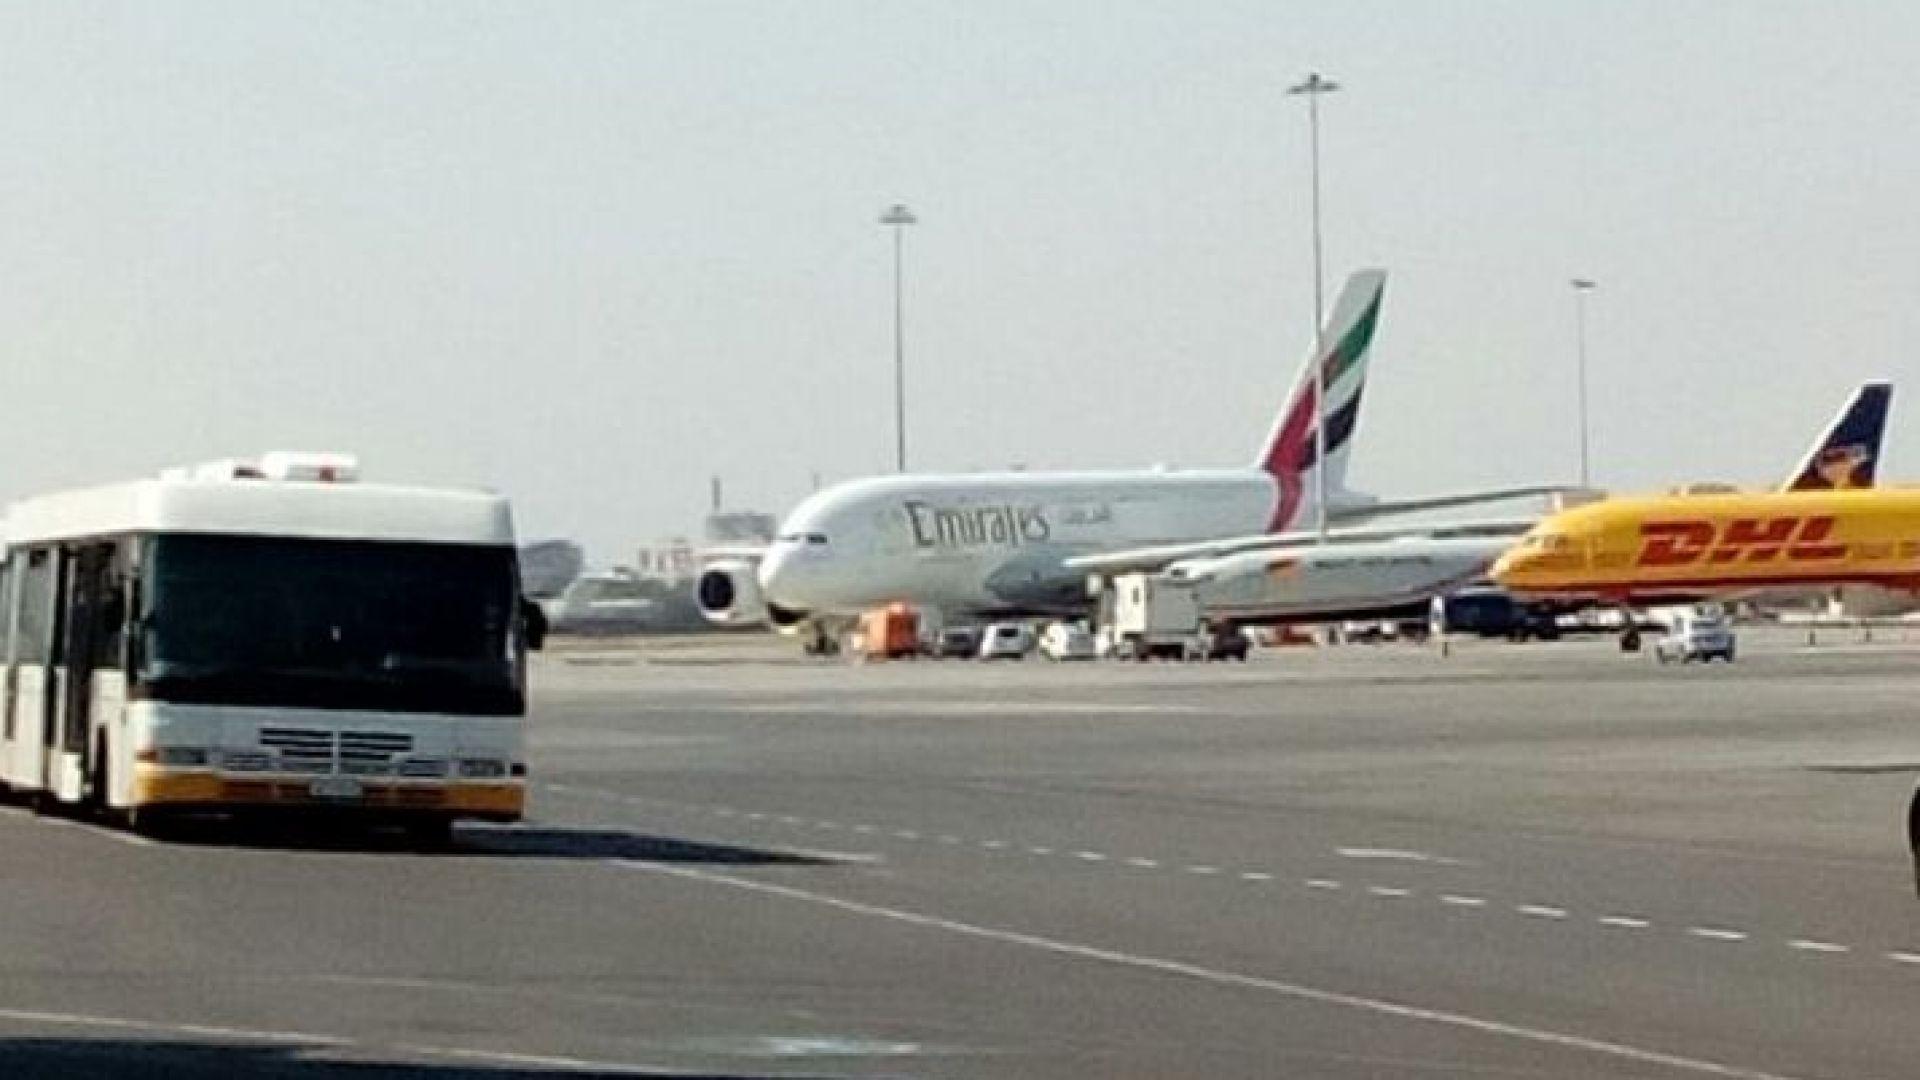 Самолет кацна аварийно на летище София заради болен пасажер, обслужен е